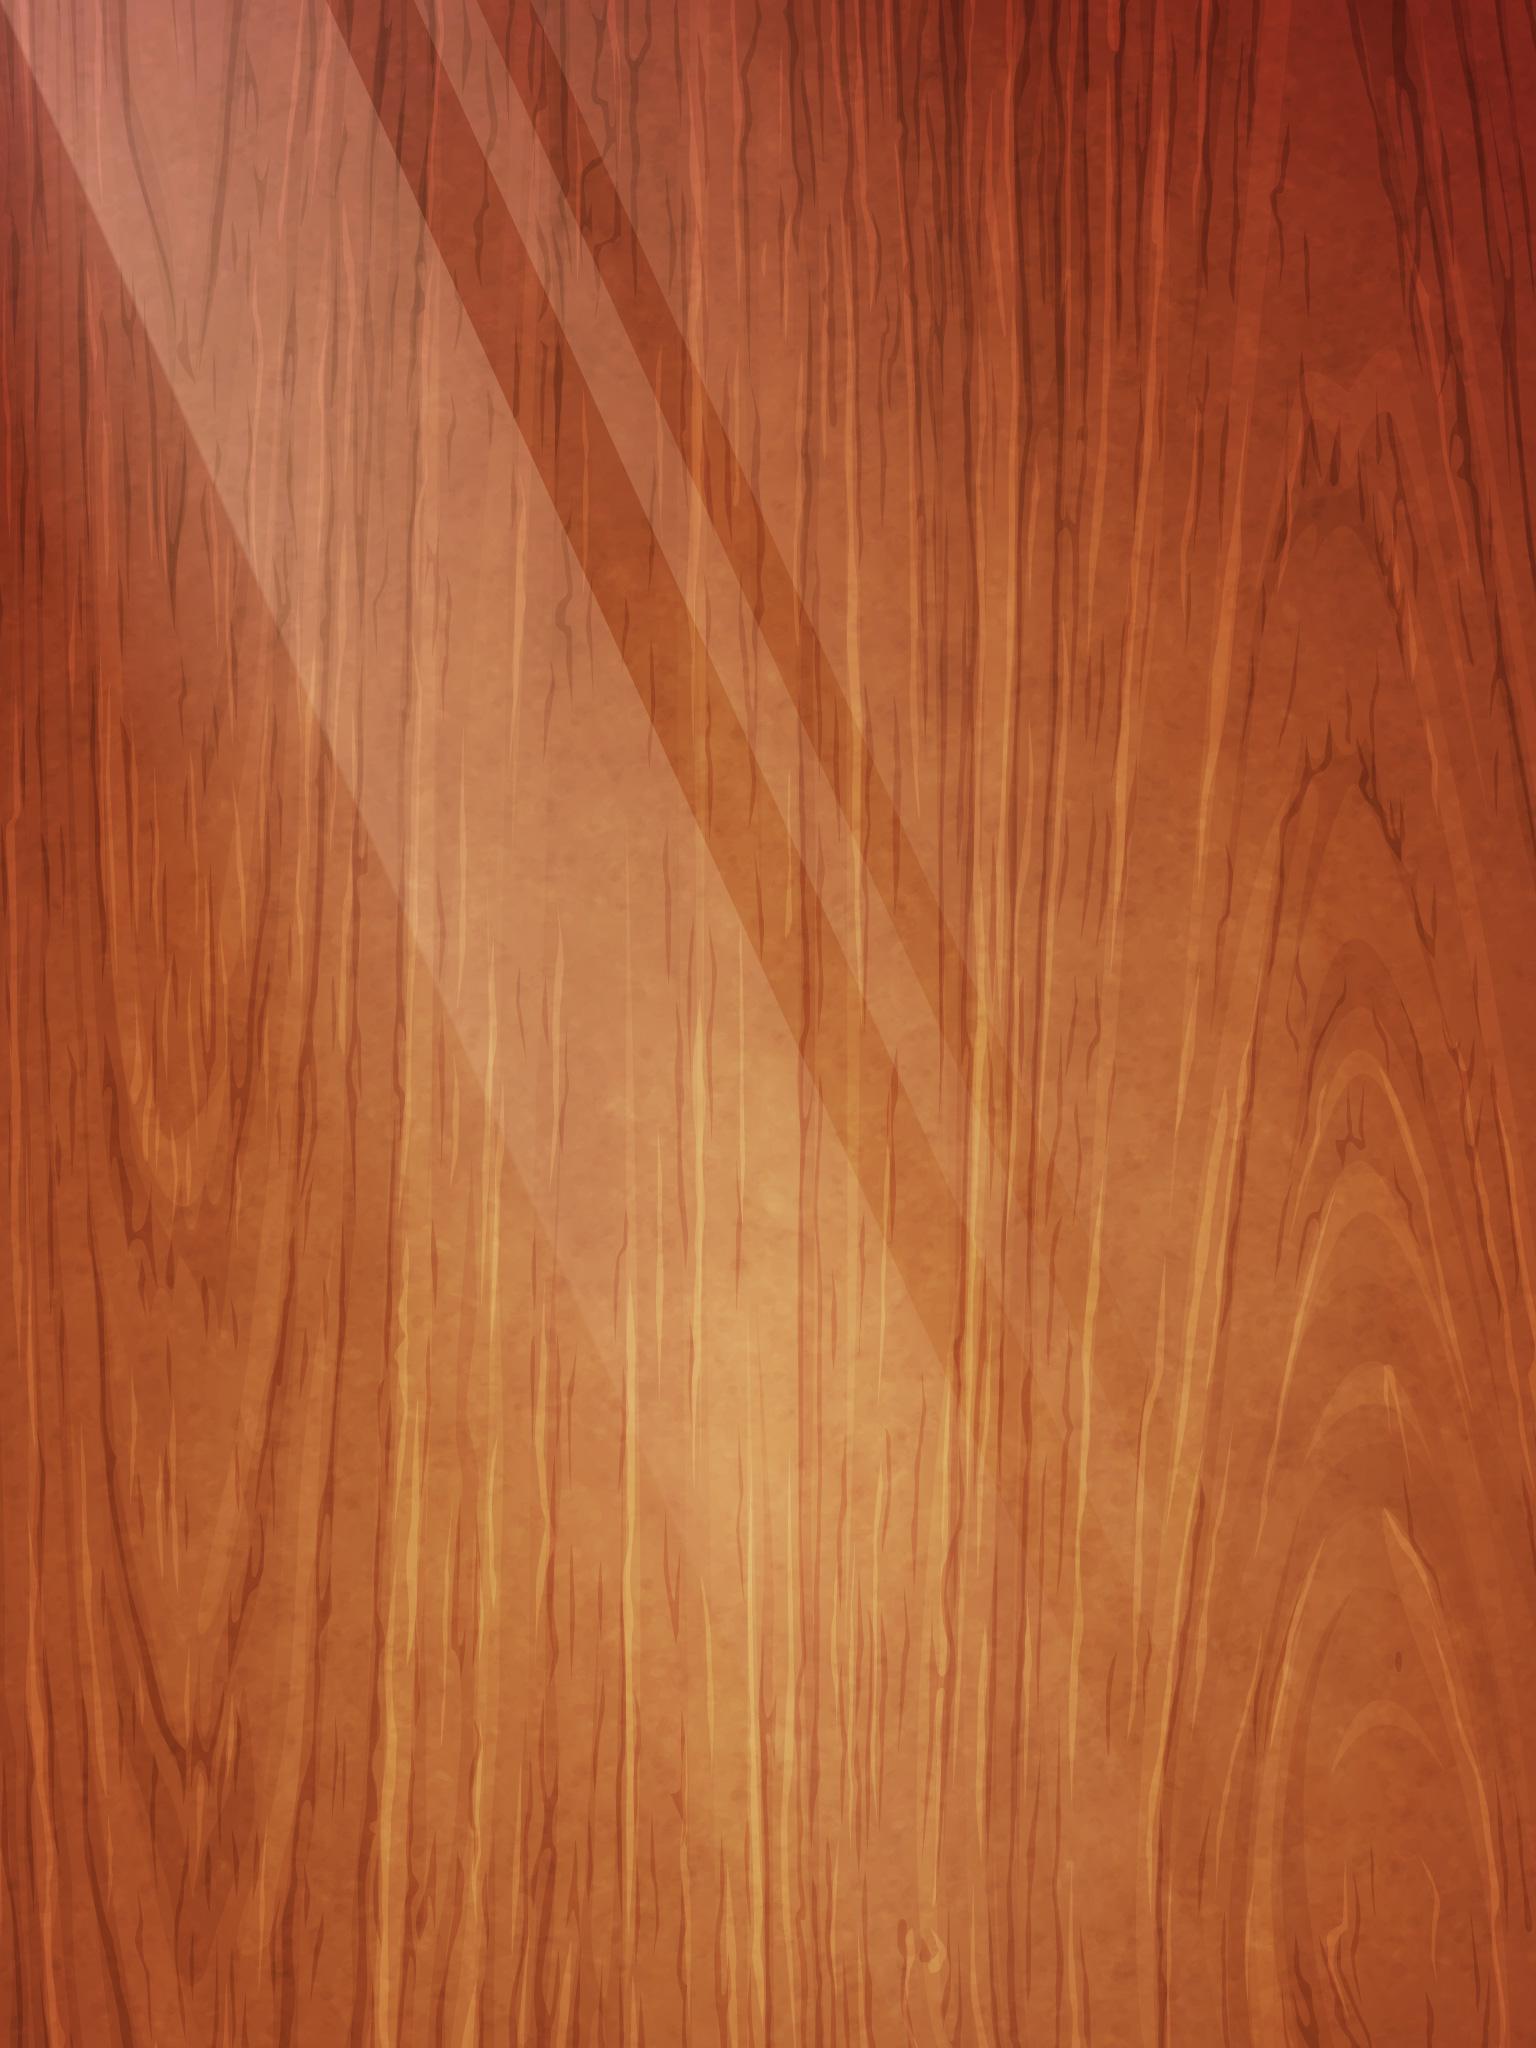 Wood texture hd